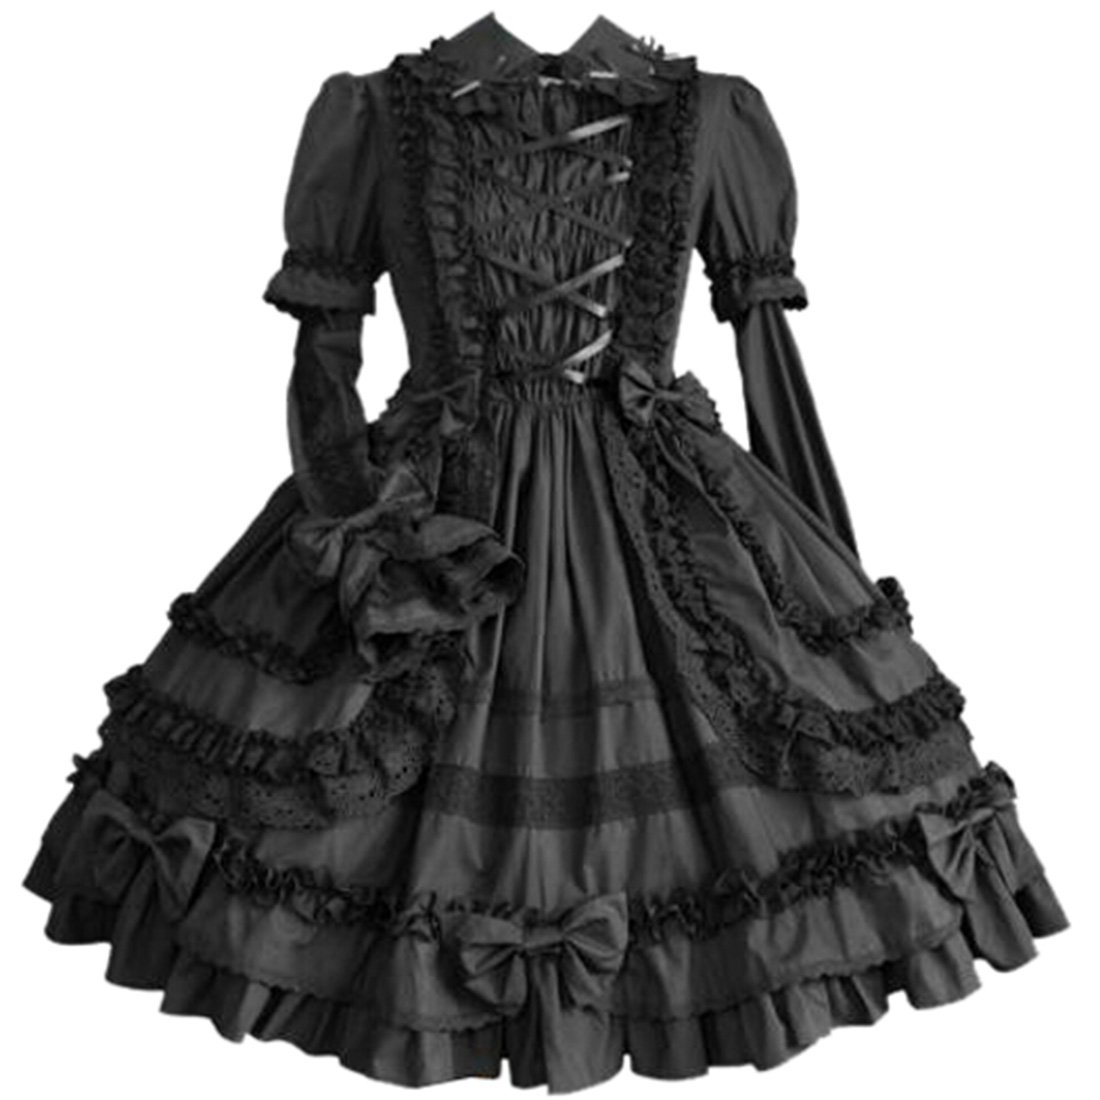 Partiss Women Long Sleeve Multi Layer Sweet Lolita Gothic Lolita Dress, XS, Black by Partiss (Image #1)